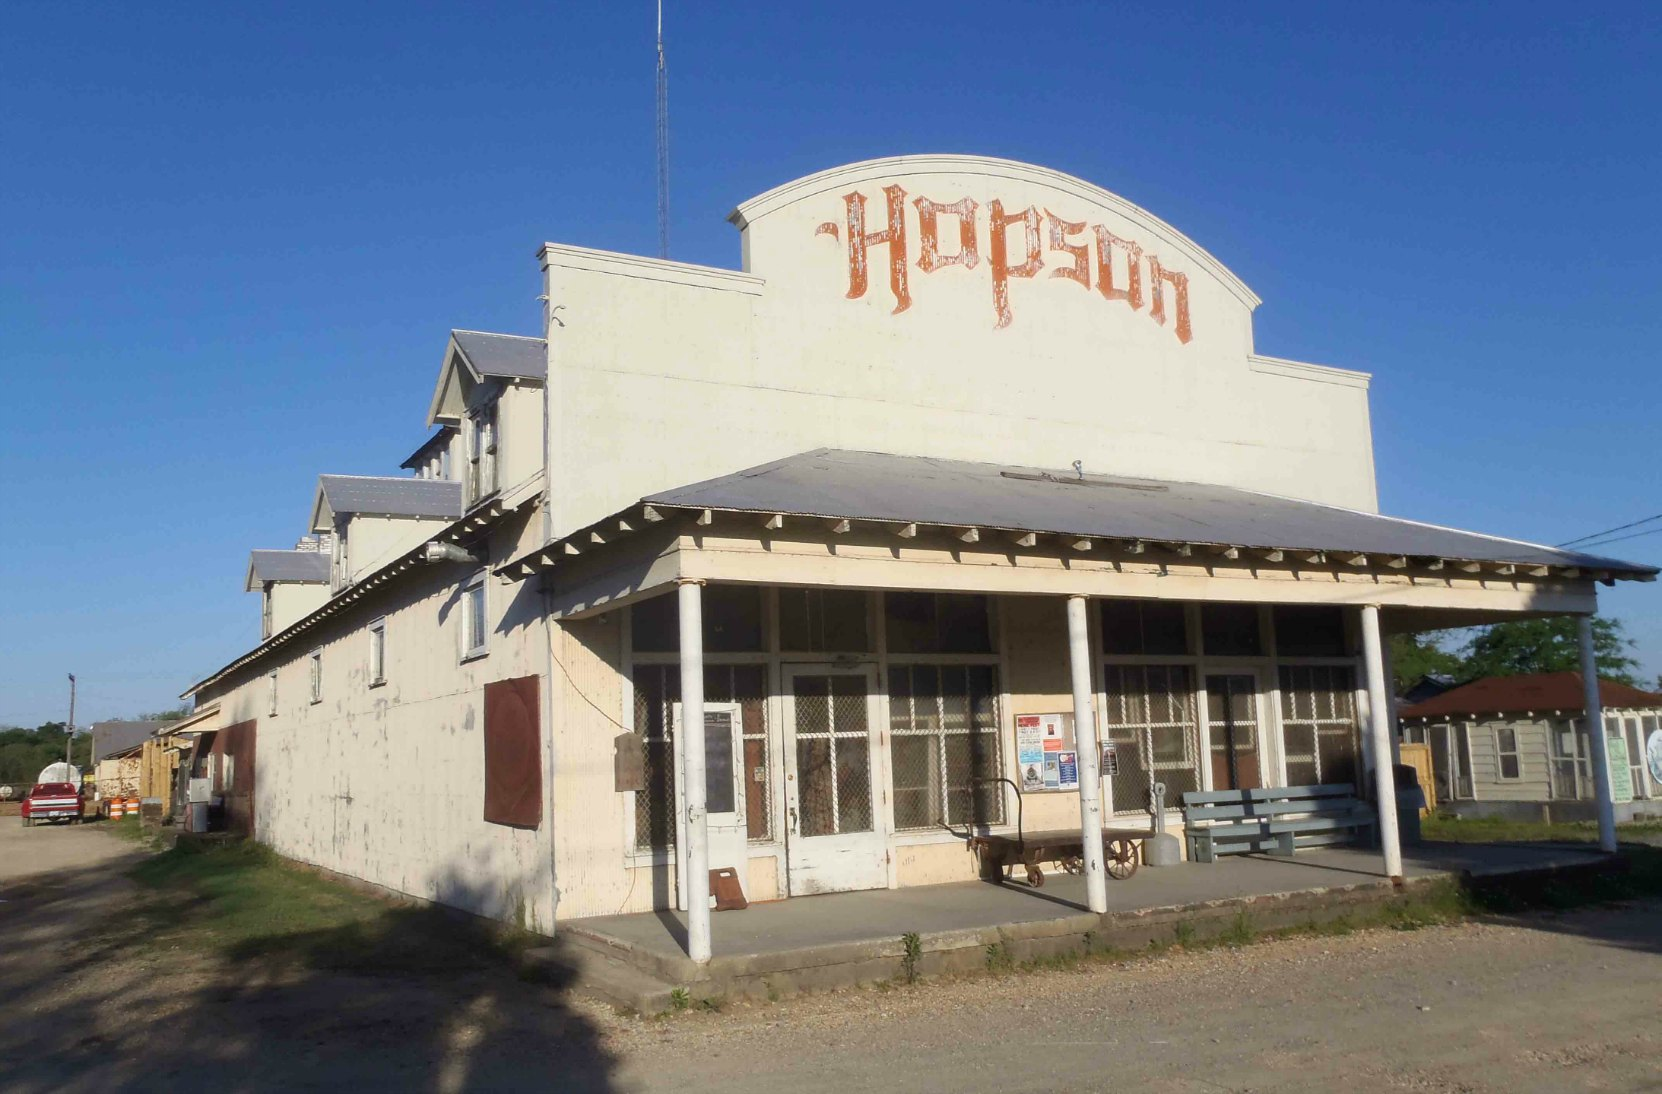 Mississippi coahoma county sherard - Commissary Building Hopson Farm Highway 49 Coahoma County Mississippi